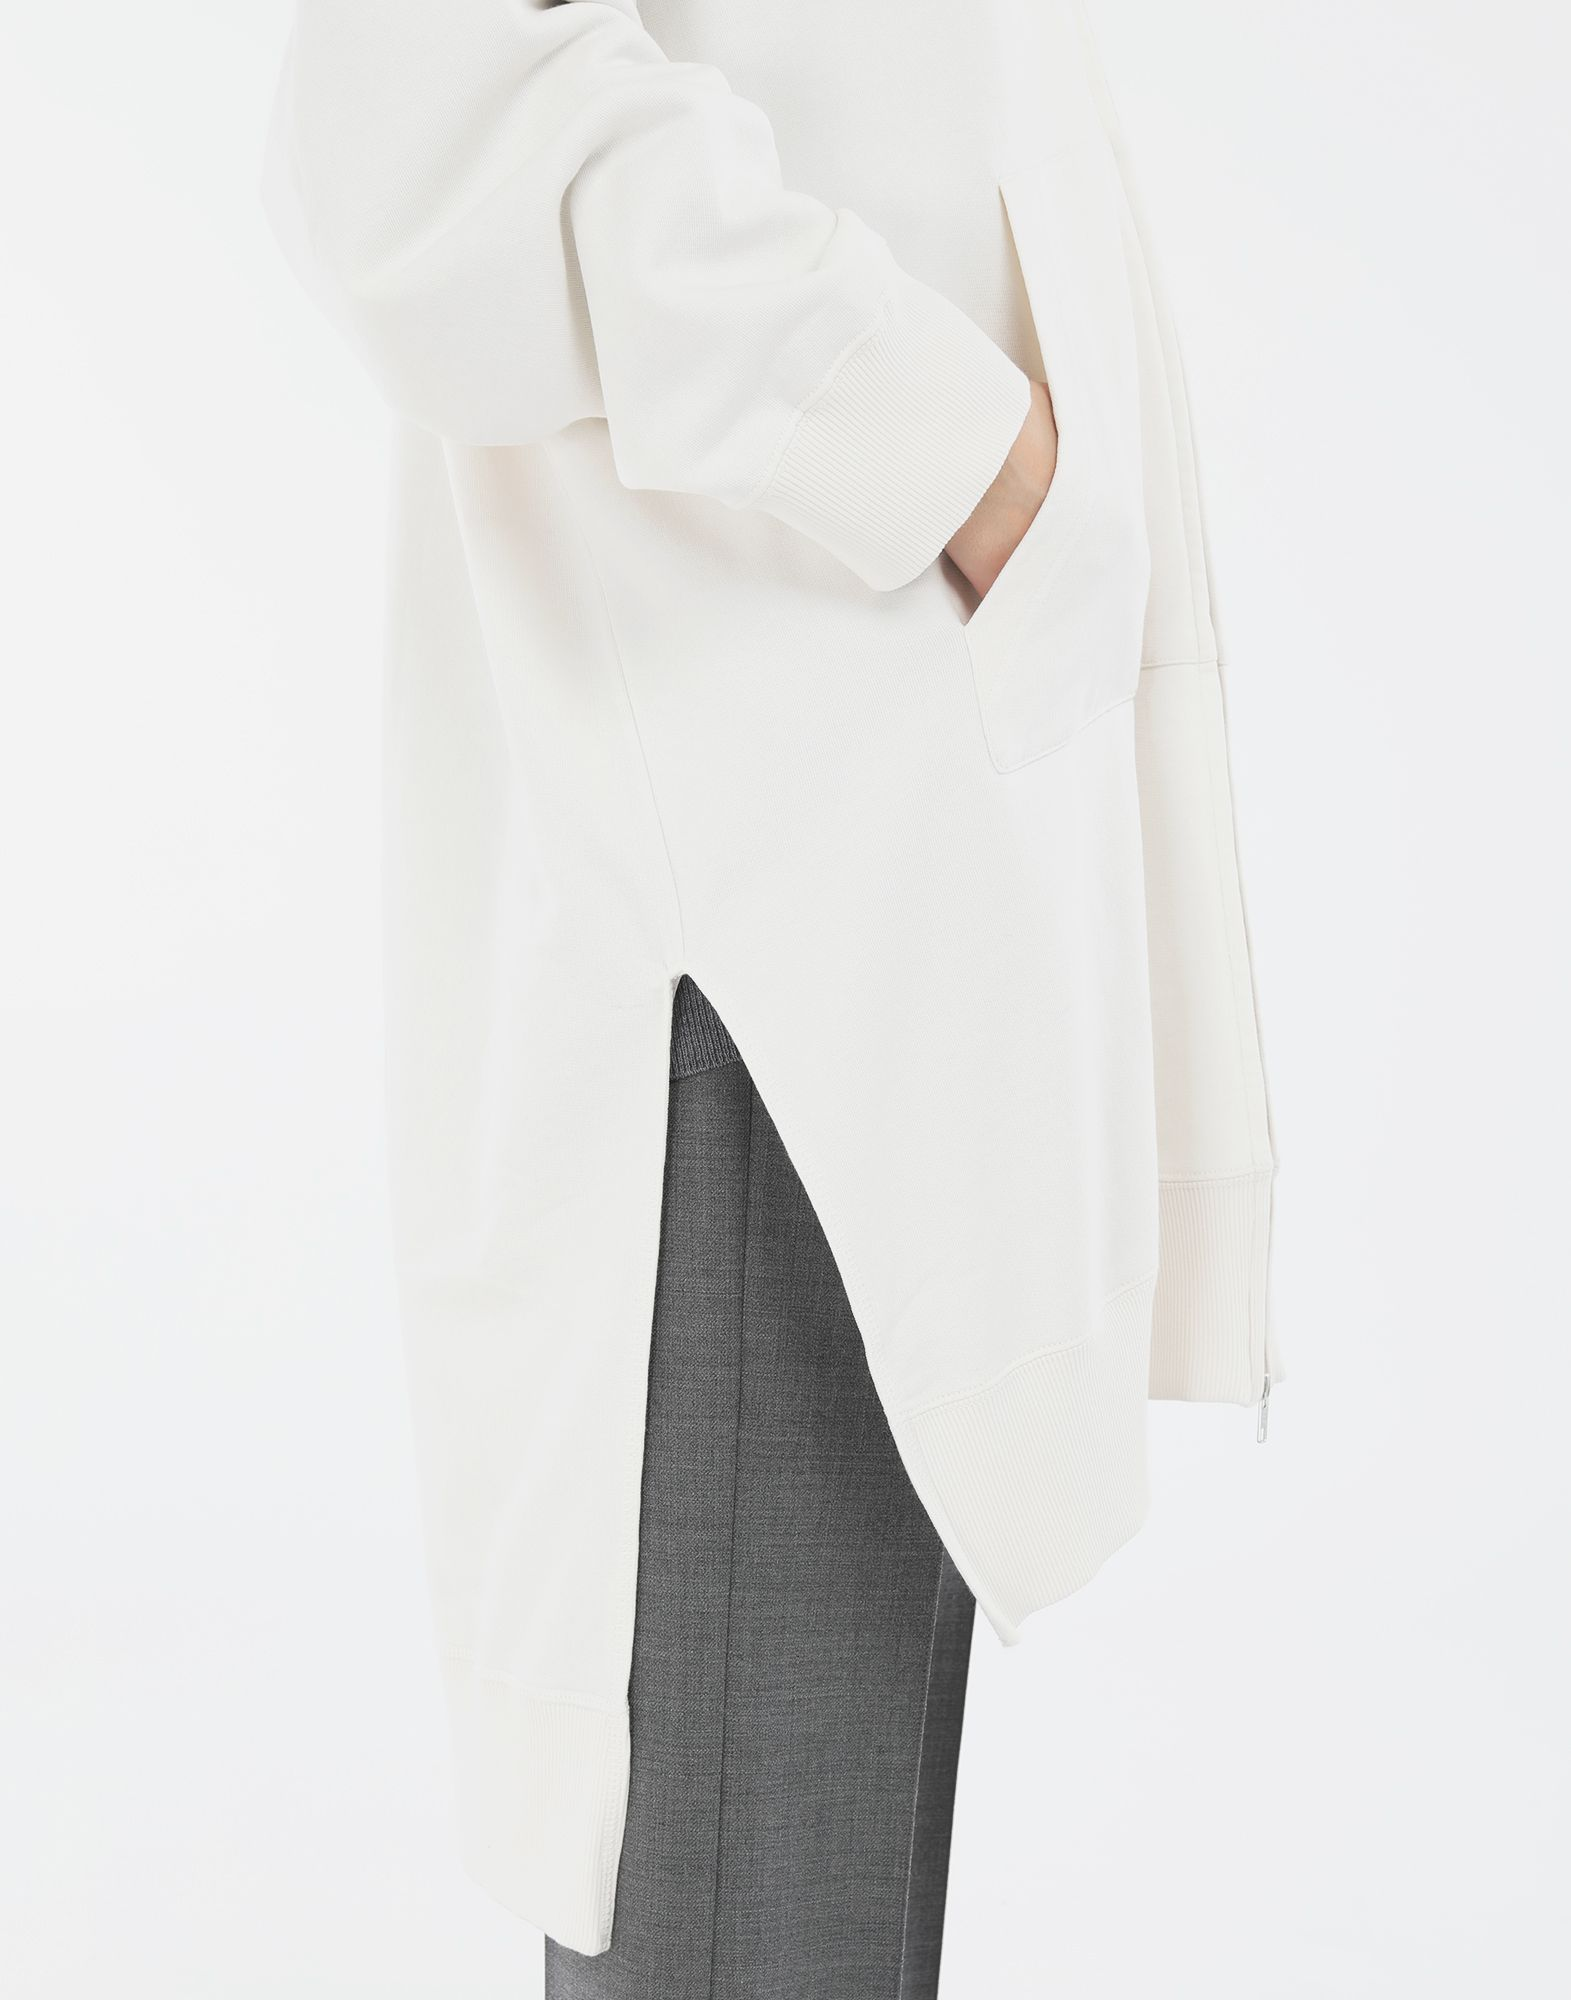 MM6 MAISON MARGIELA Long hooded sweatshirt Hooded sweatshirt Woman b